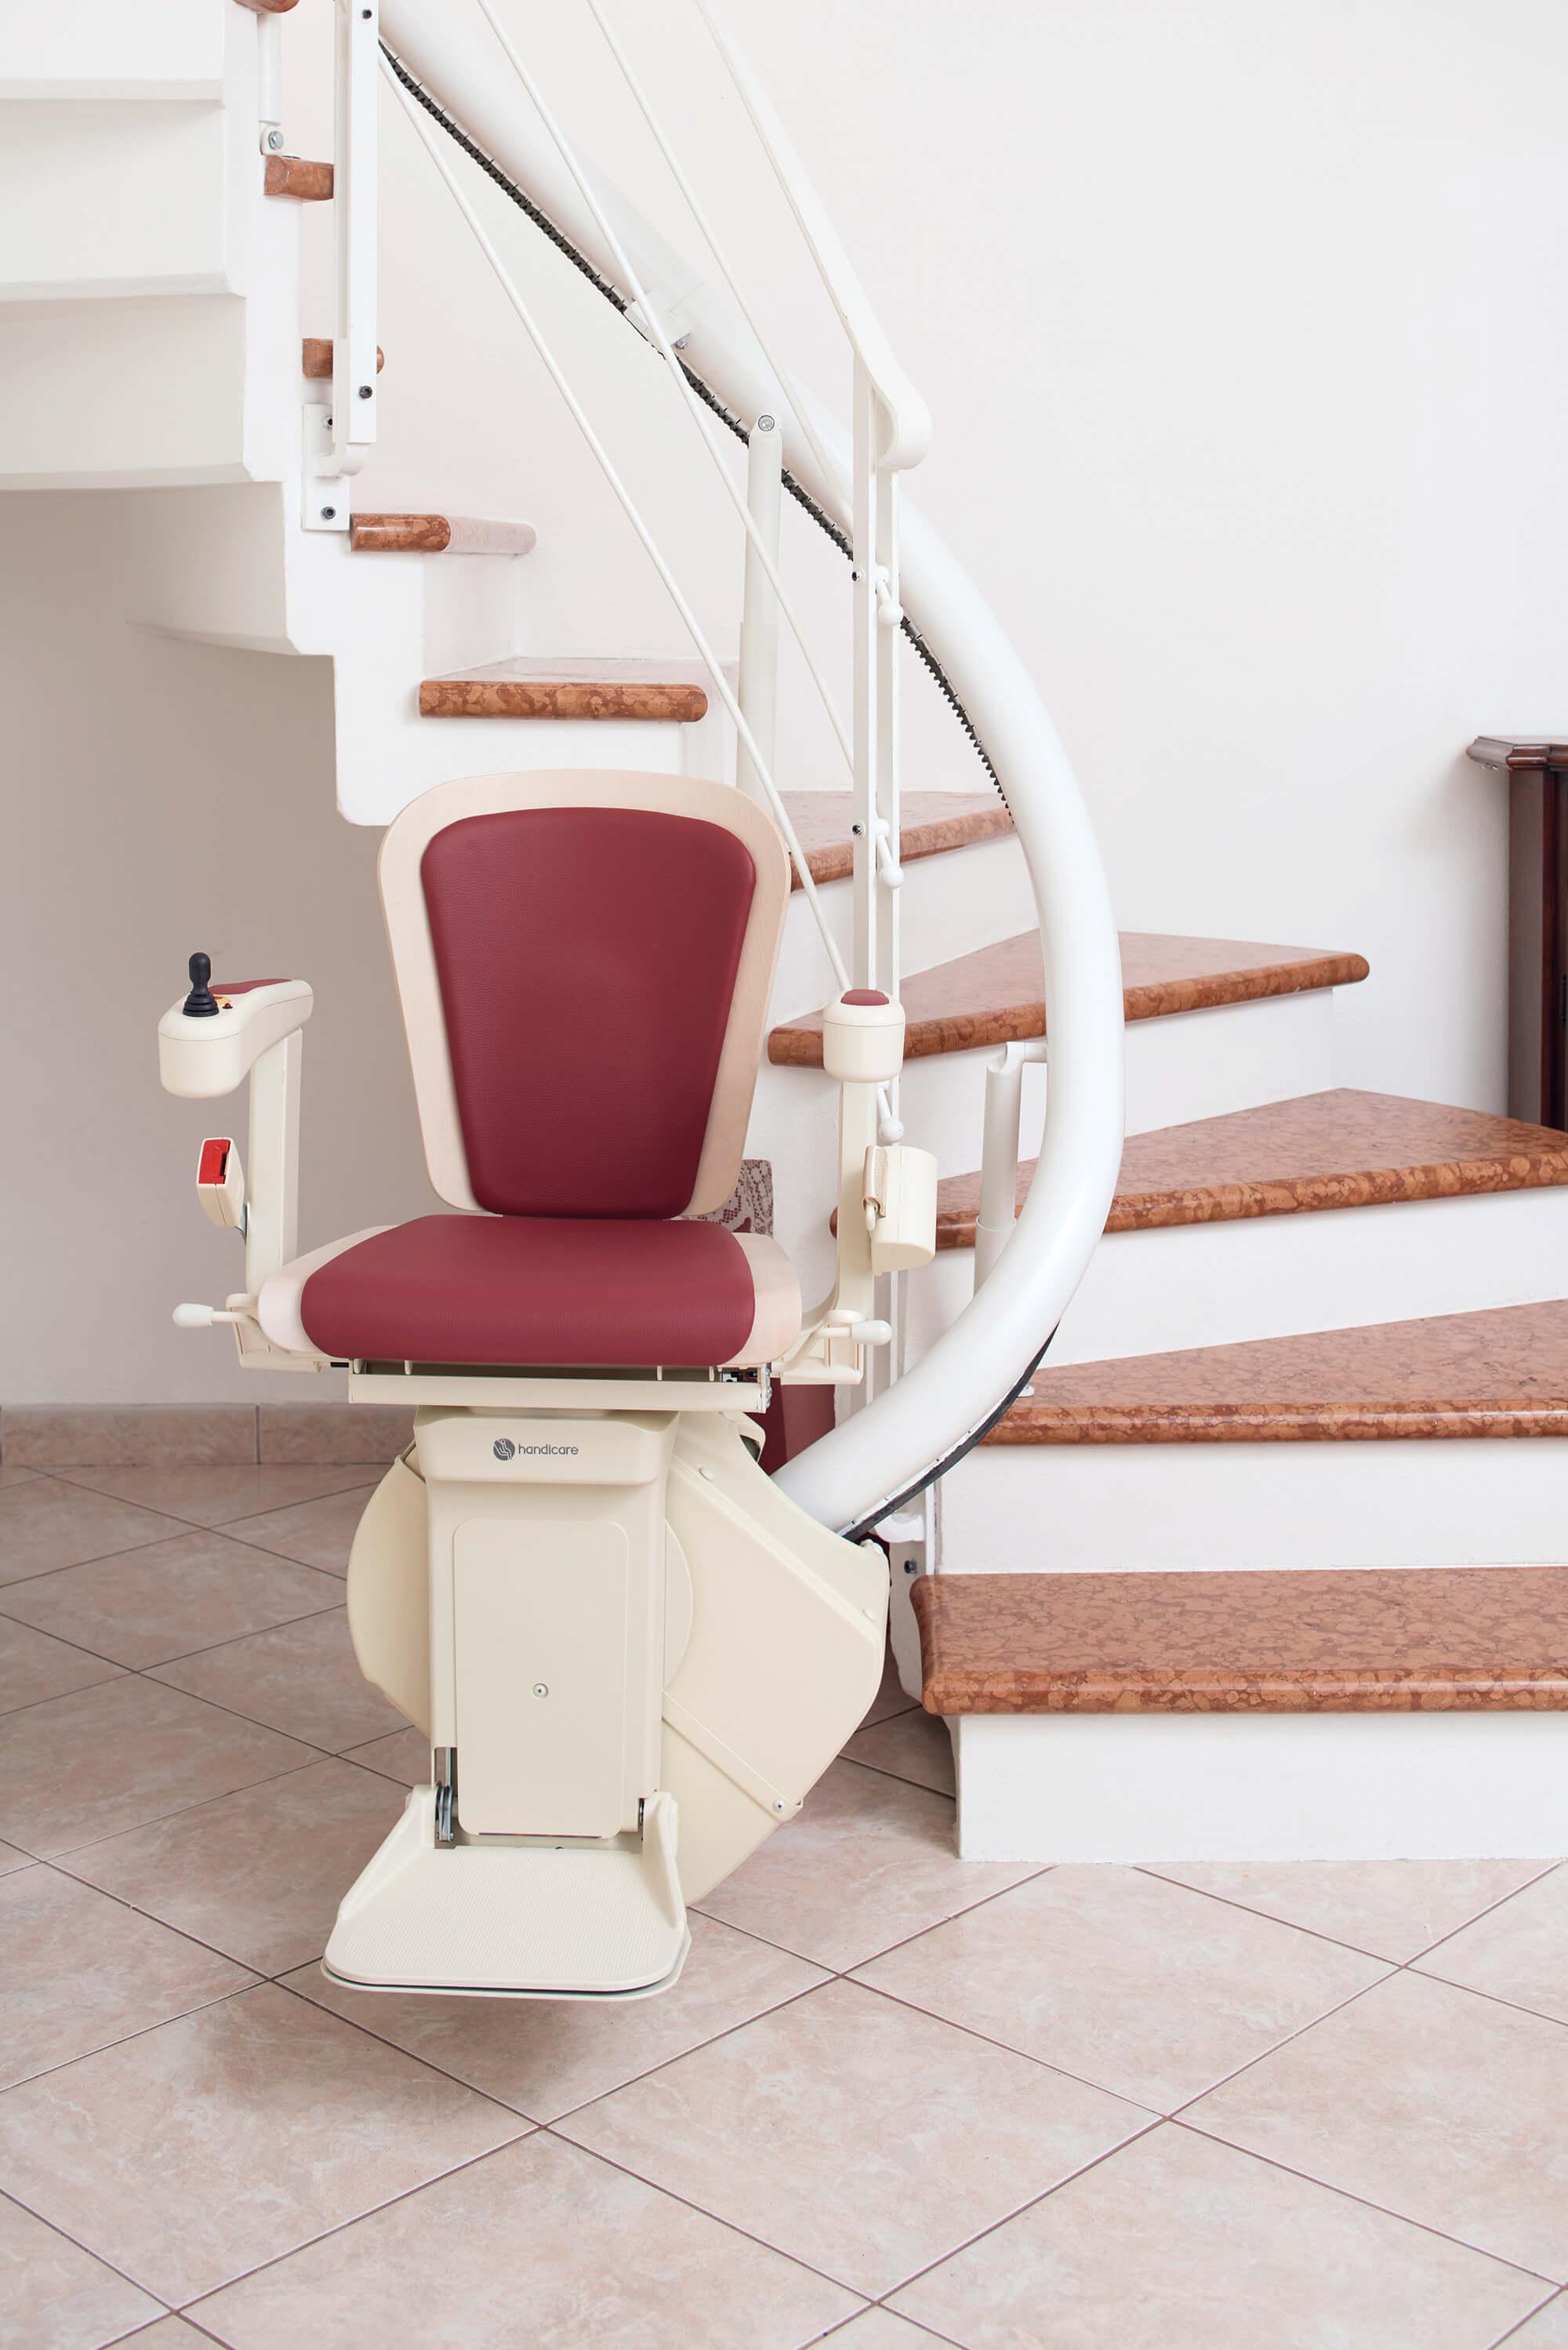 Siège monte-escalier